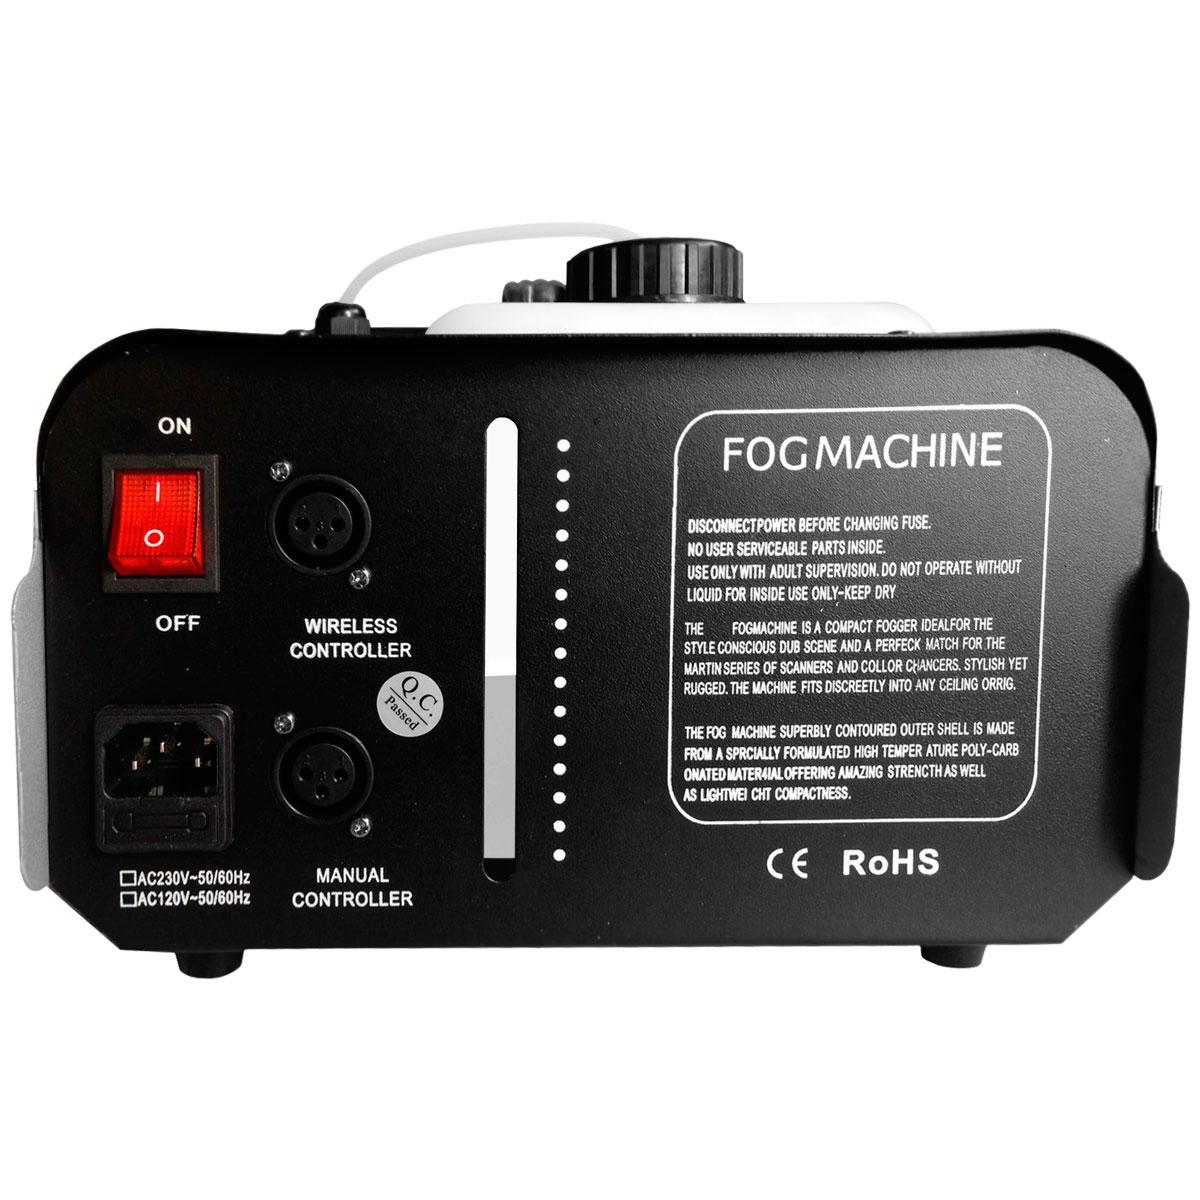 Máquina de Fumaça 1500W 110V c/ Controle Remoto HI-603 - Spectrum